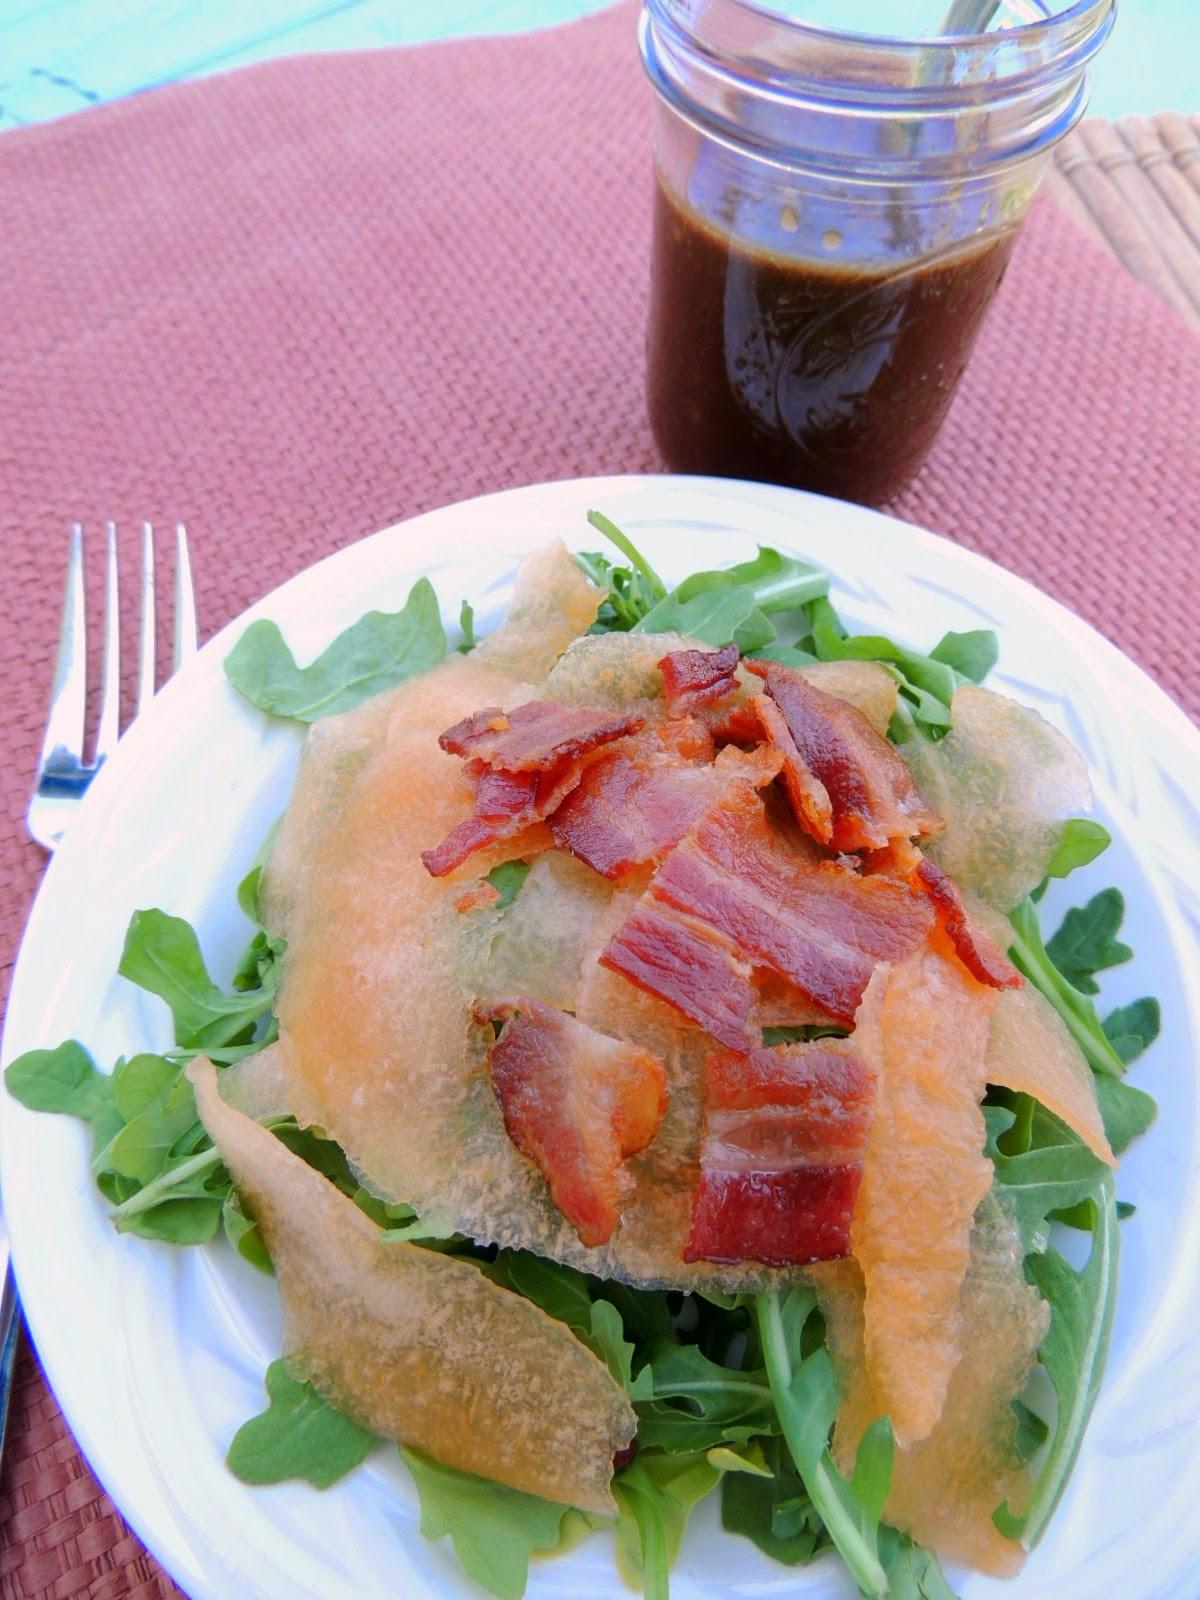 Bacon, Cantaloupe, and Arugula Salad with Bacon Balsamic Dressing via thefrugalfoodiemama.com